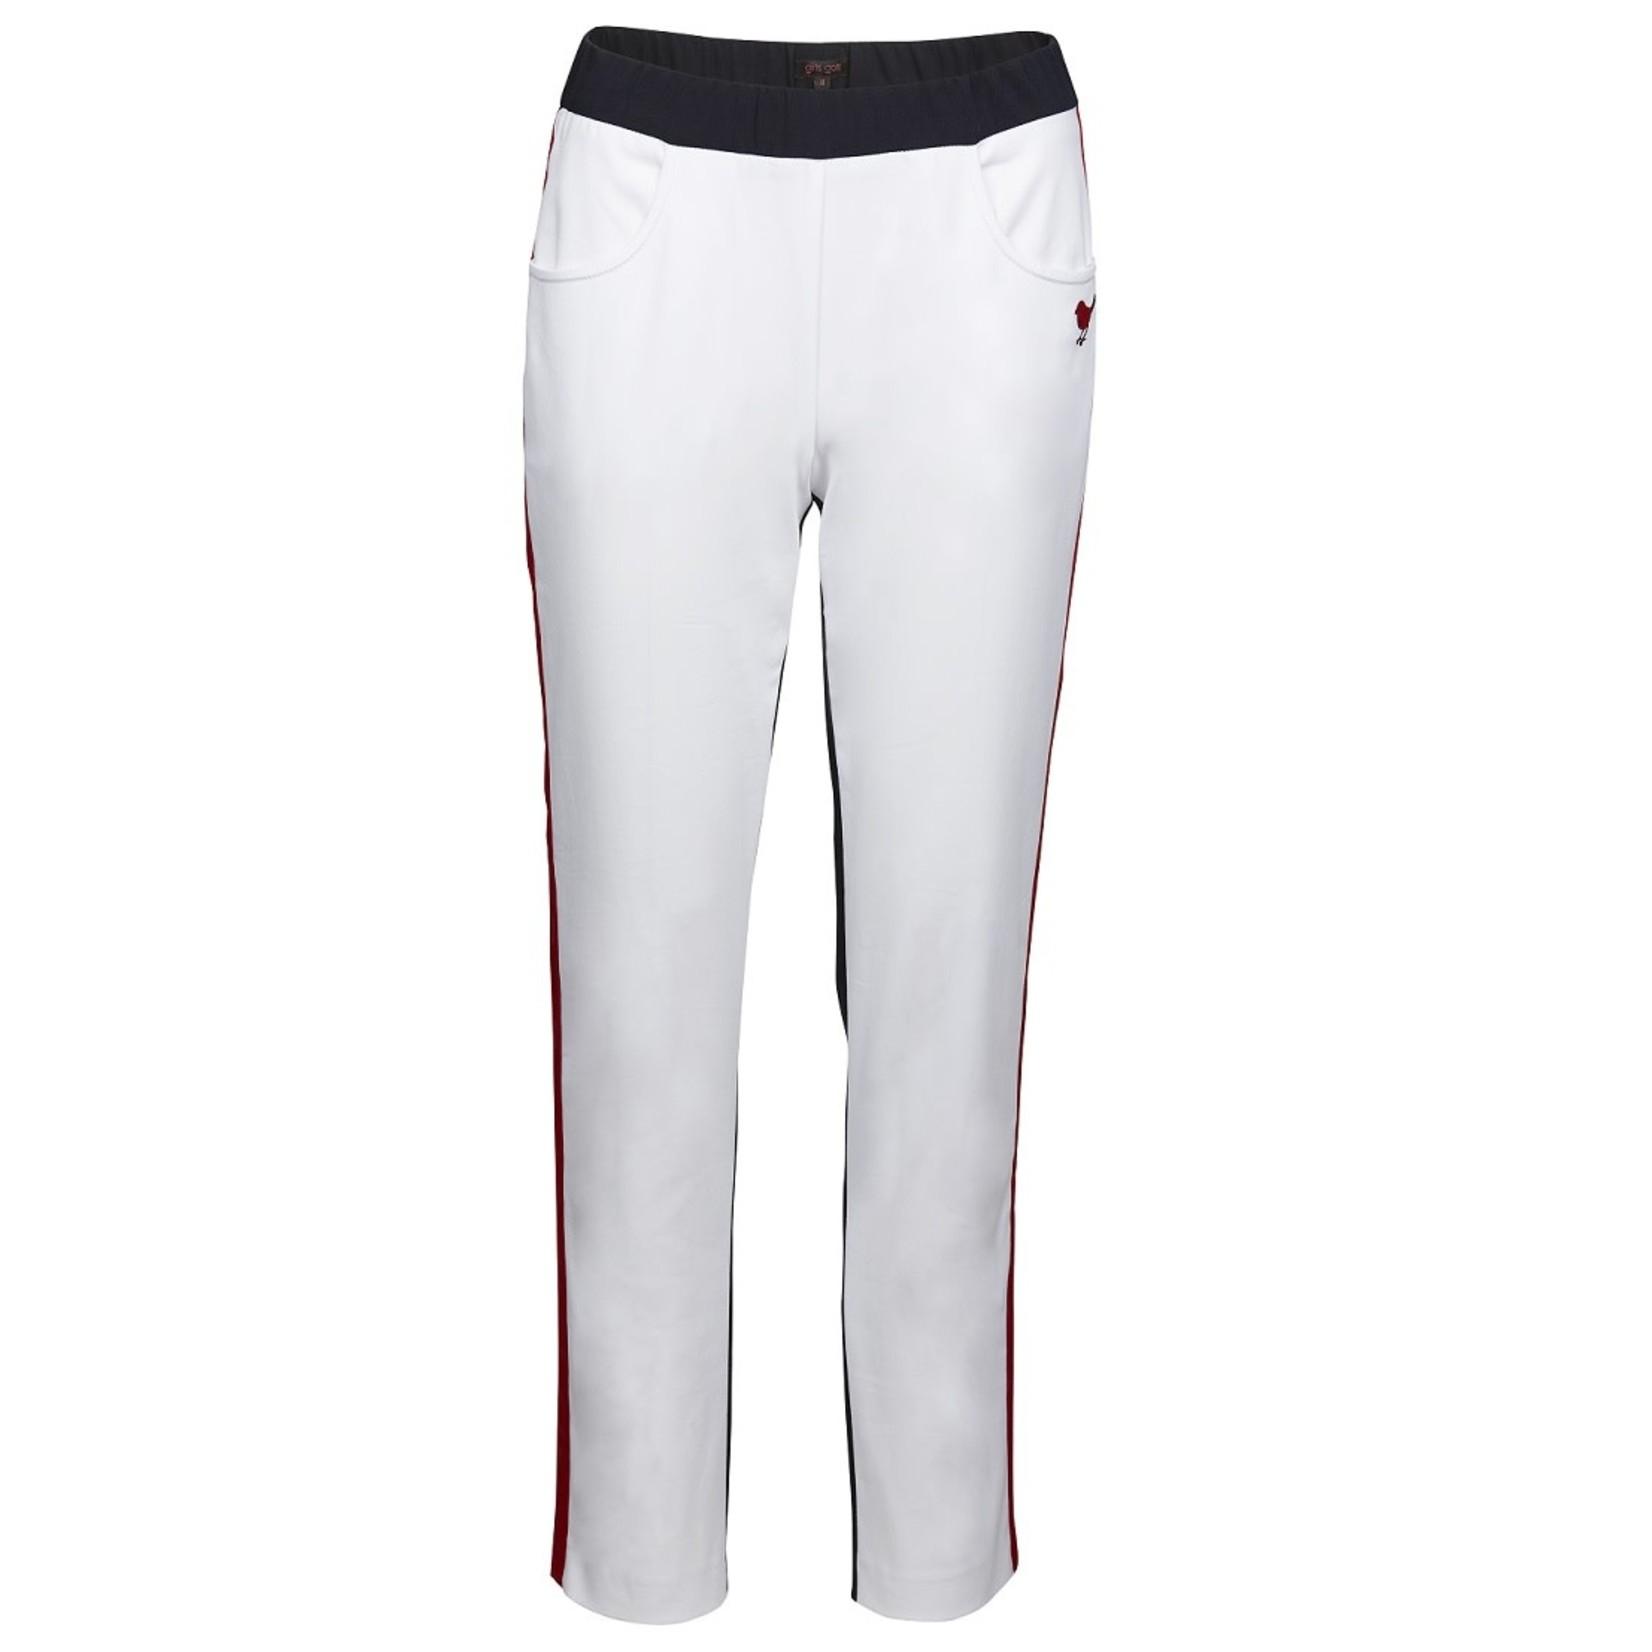 Girls Golf Girls Golf Long Pant - White/Navy/Red